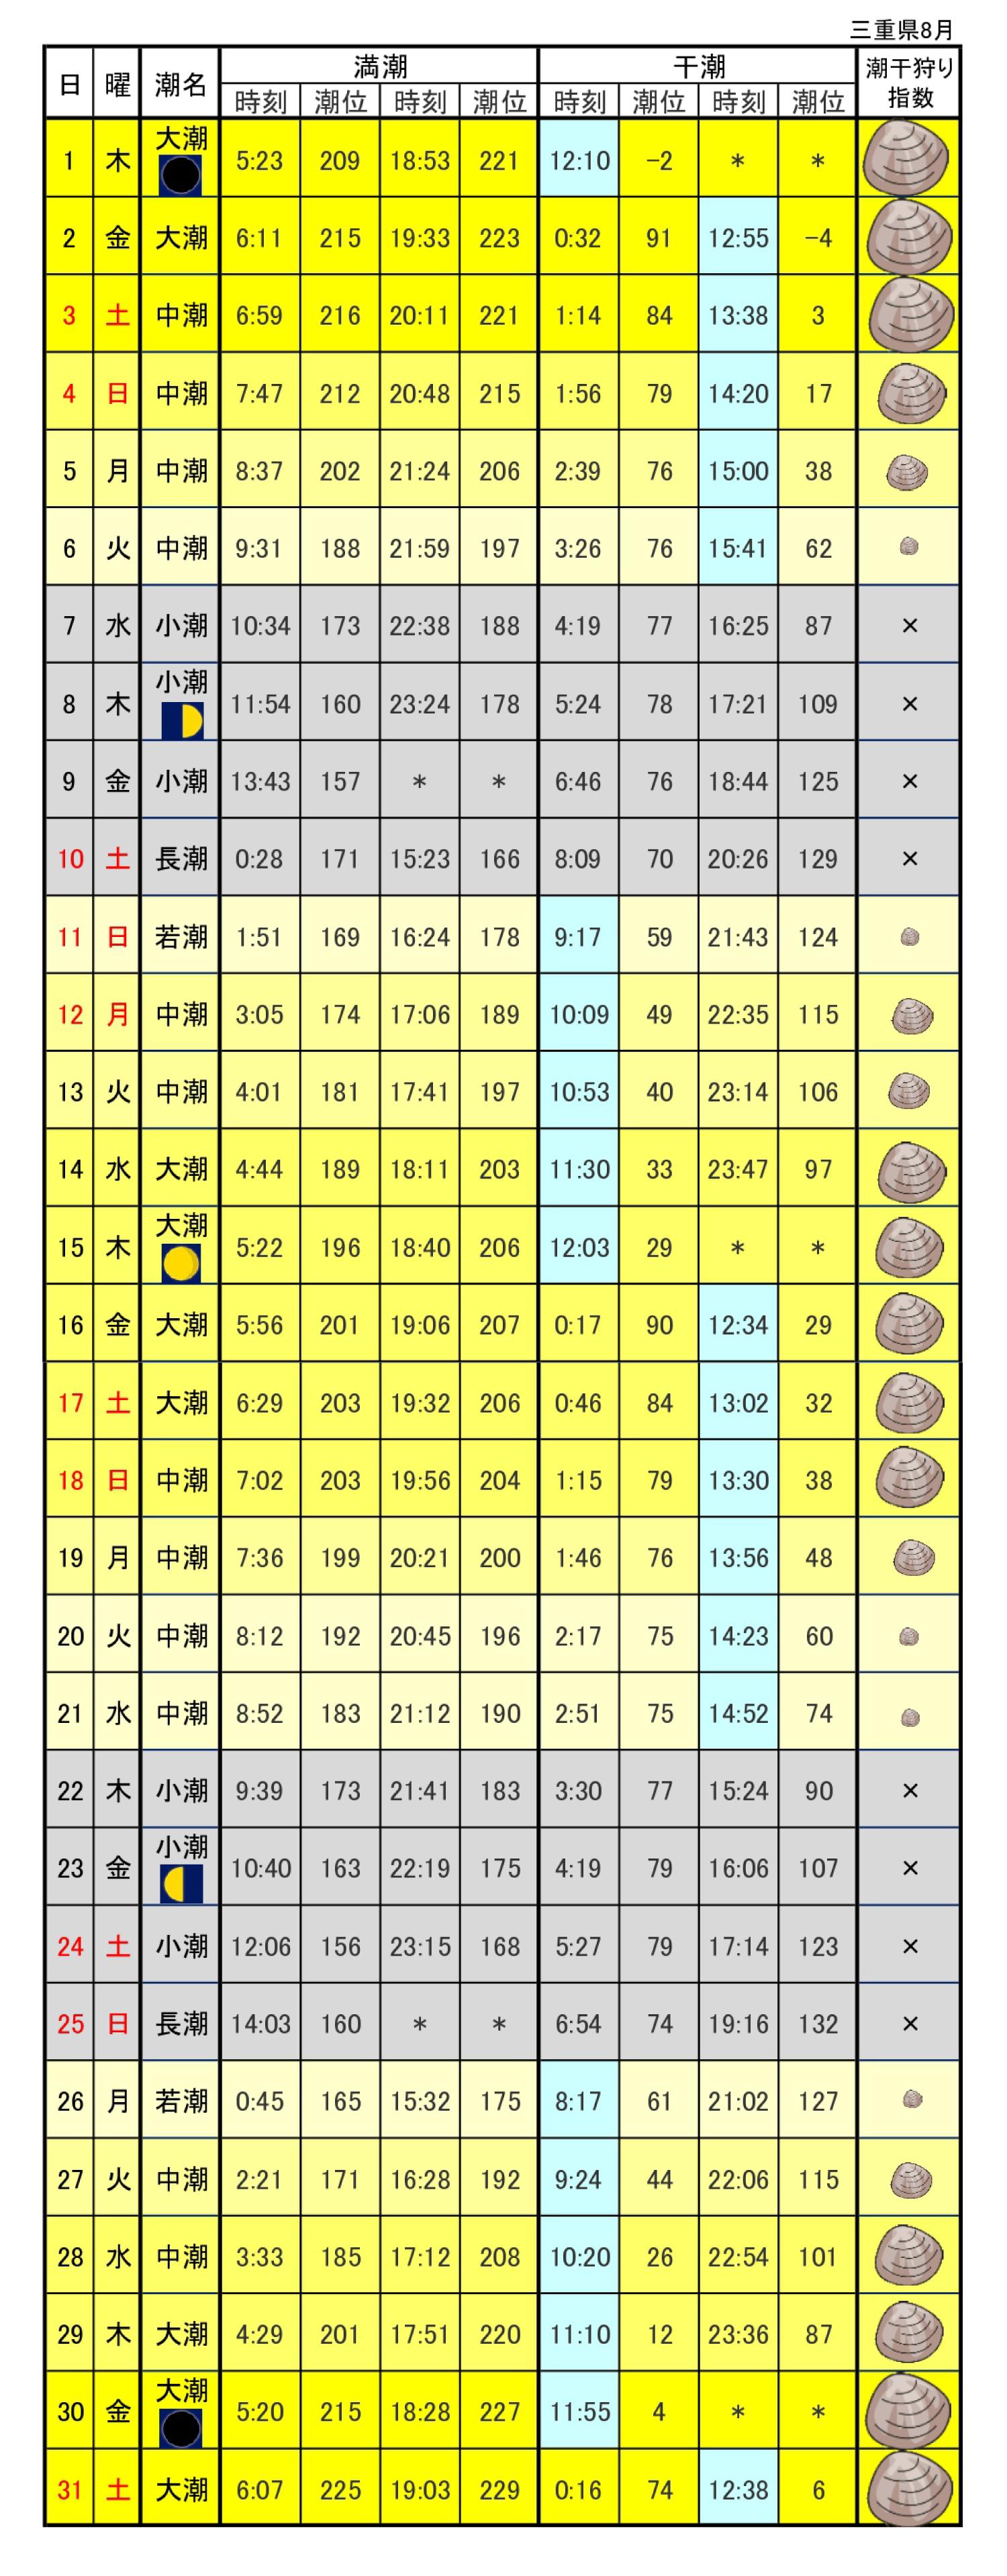 三重県潮汐表潮干狩り2019年8月